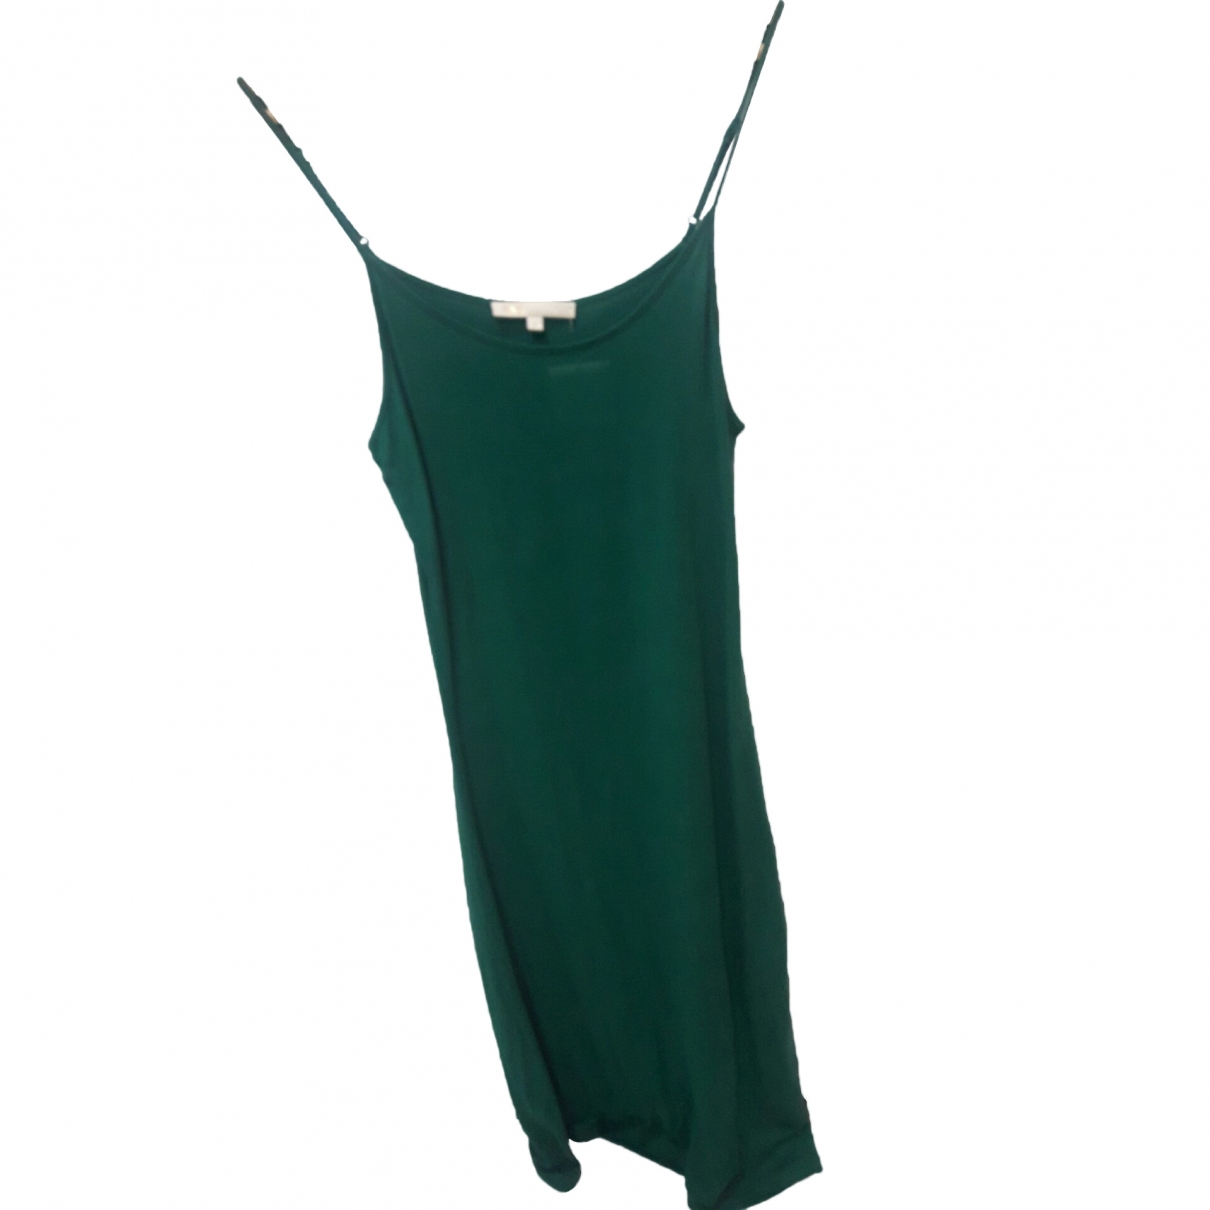 Maje \N Green dress for Women 38 FR